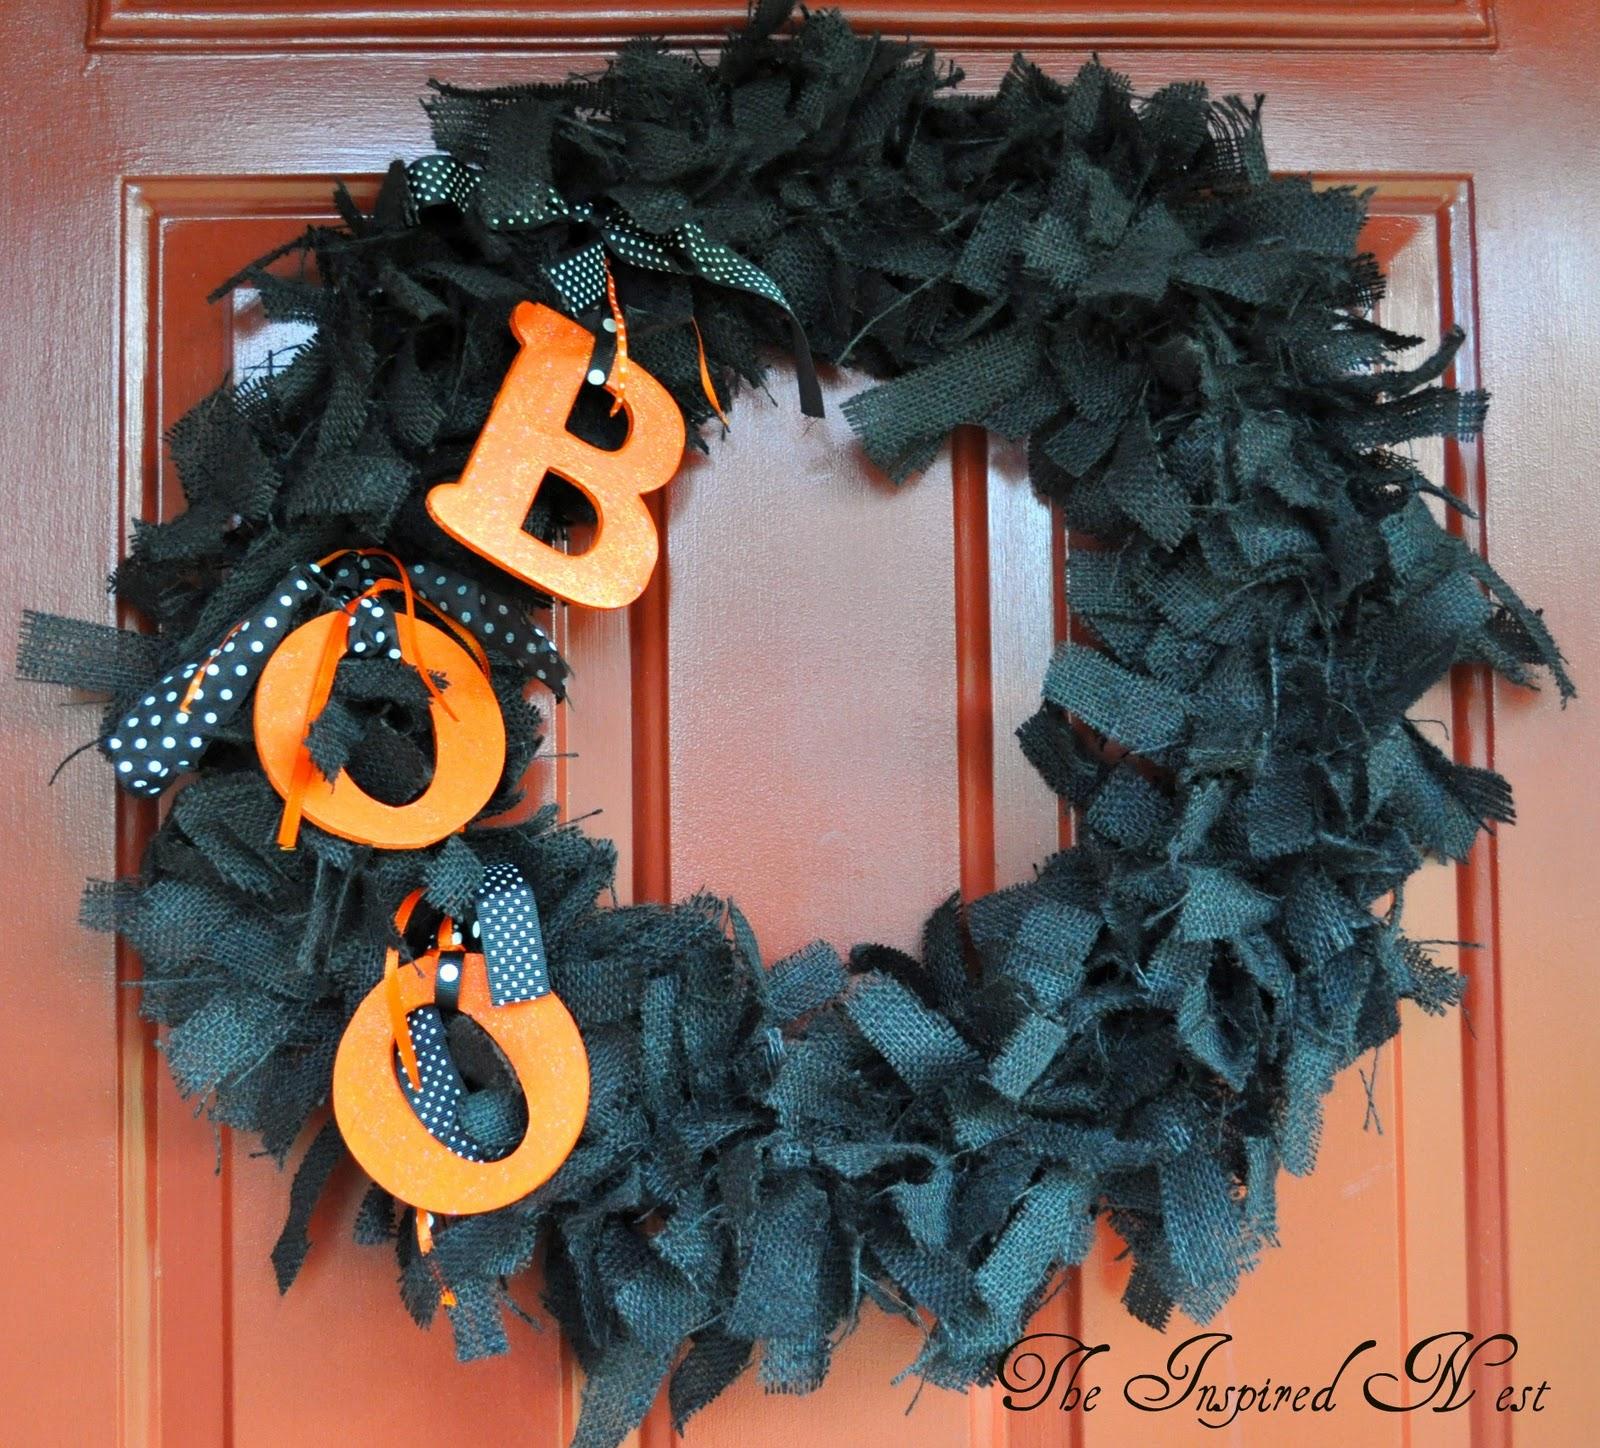 la petite vie fun halloween wreath ideas. Black Bedroom Furniture Sets. Home Design Ideas